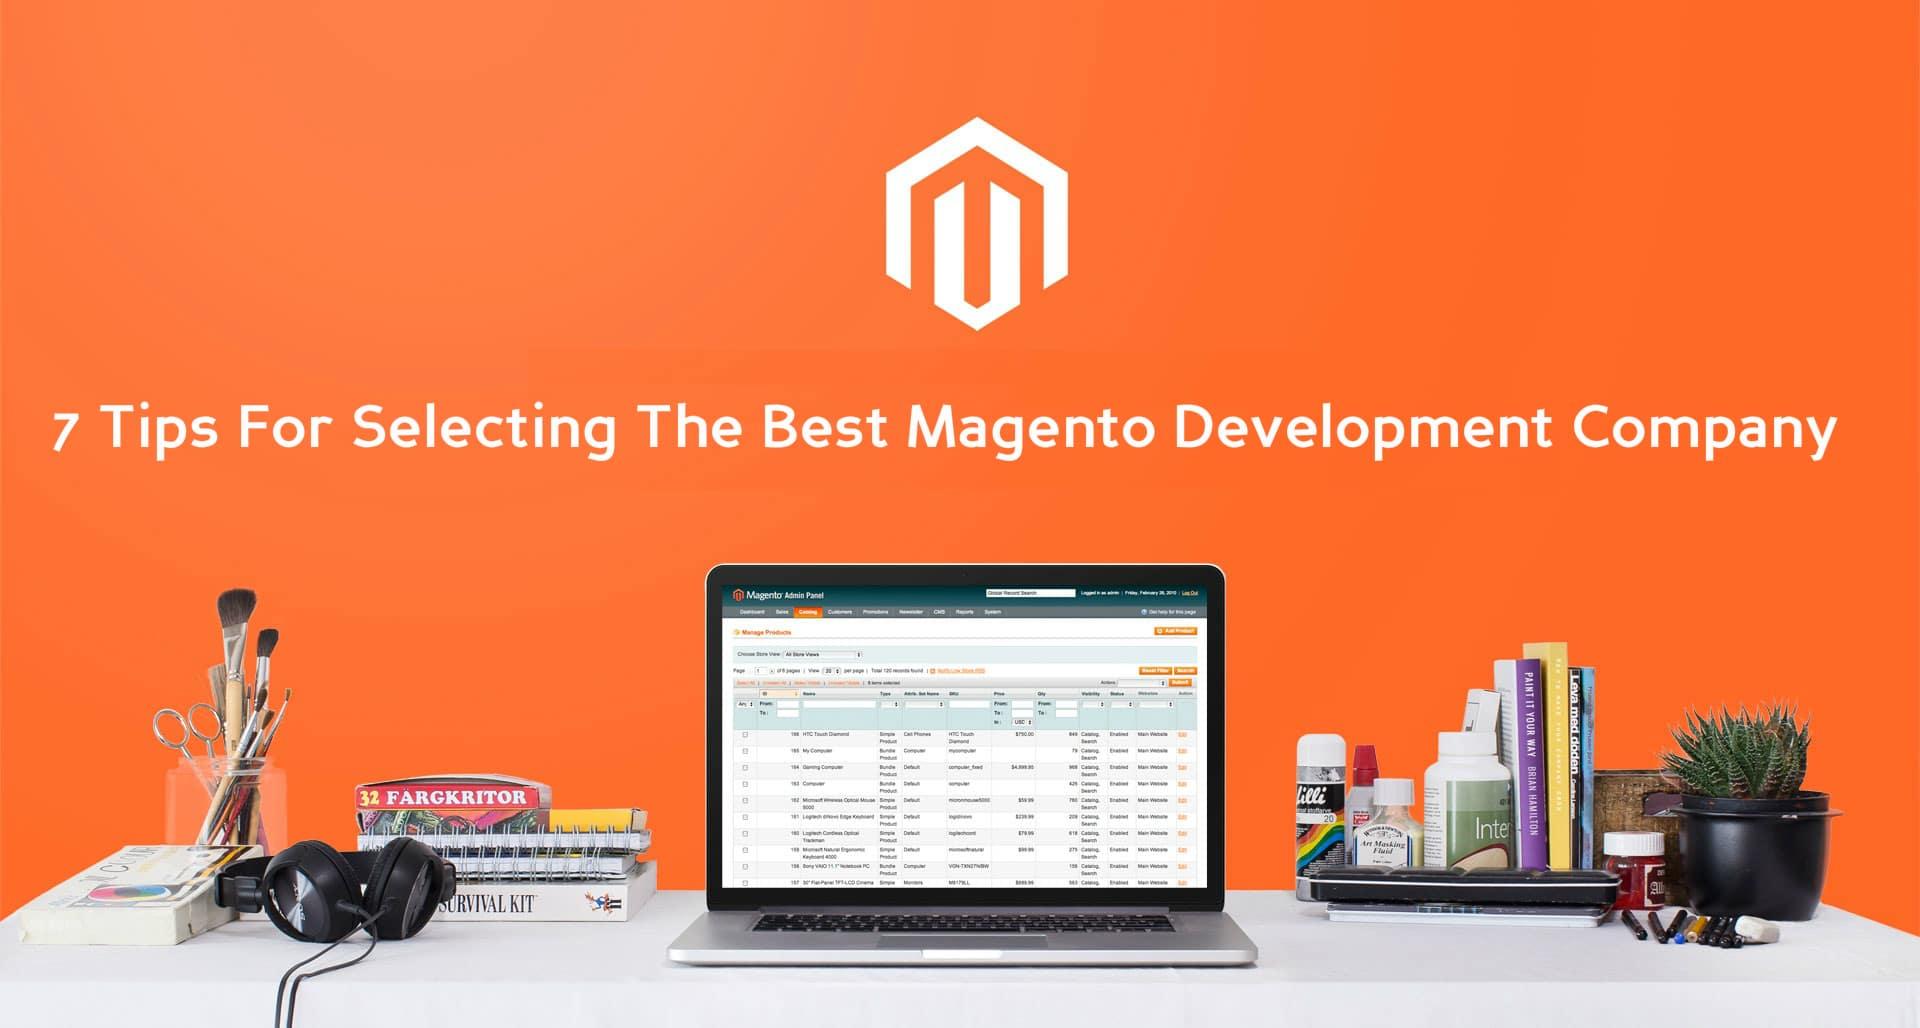 selecting-the-best-magento-development-company